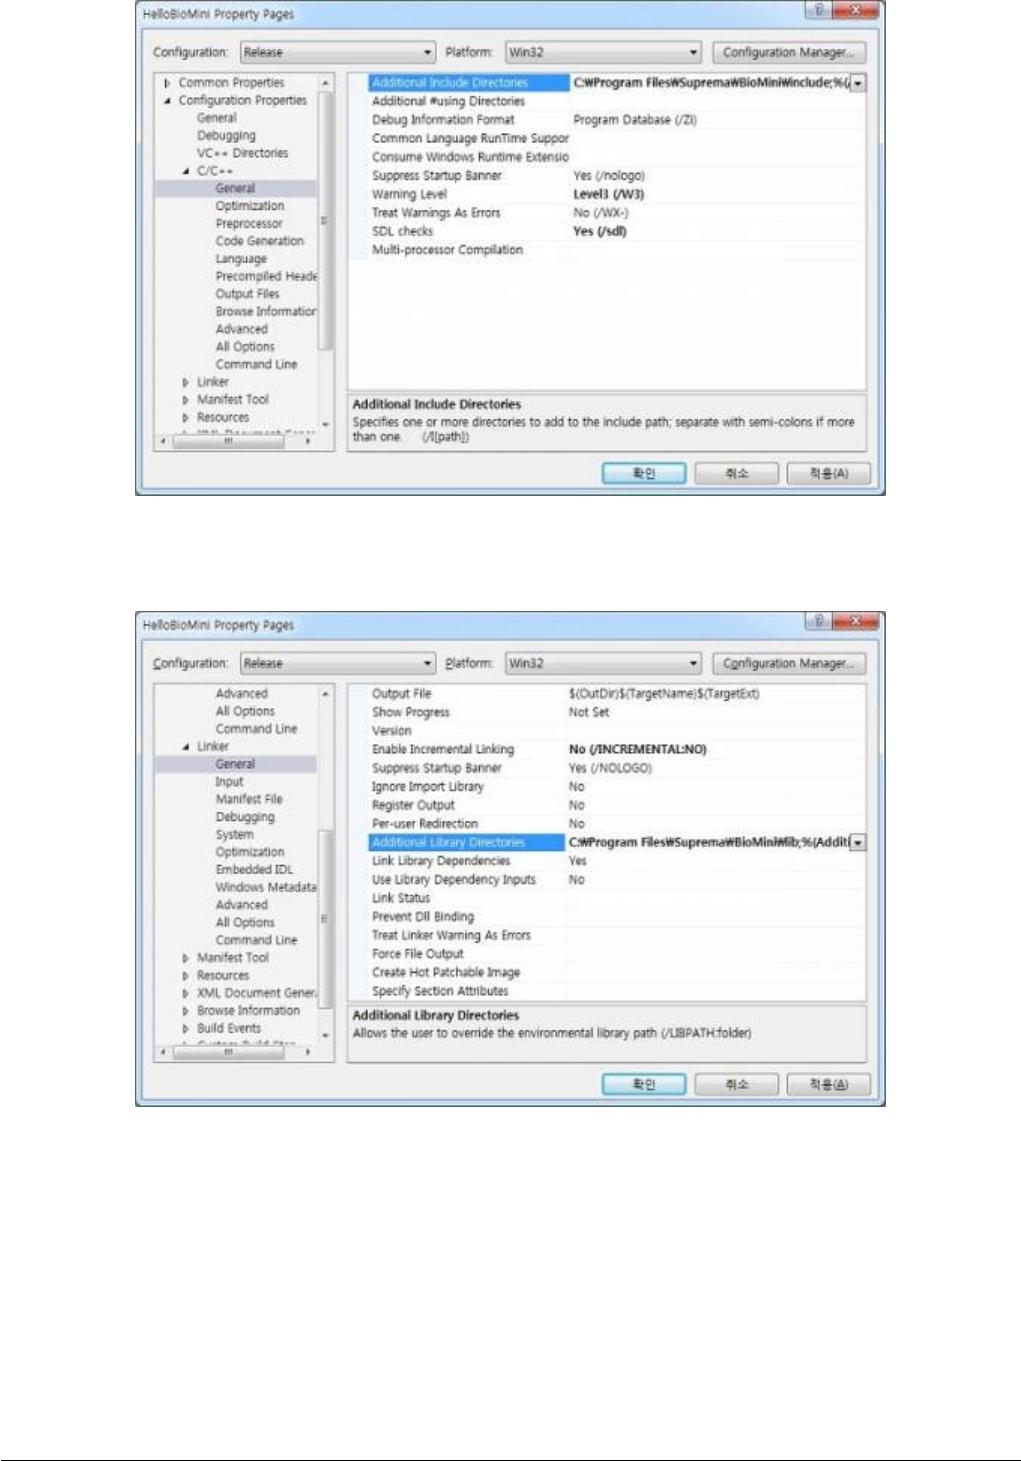 microsoft windows sdk 6.0 a